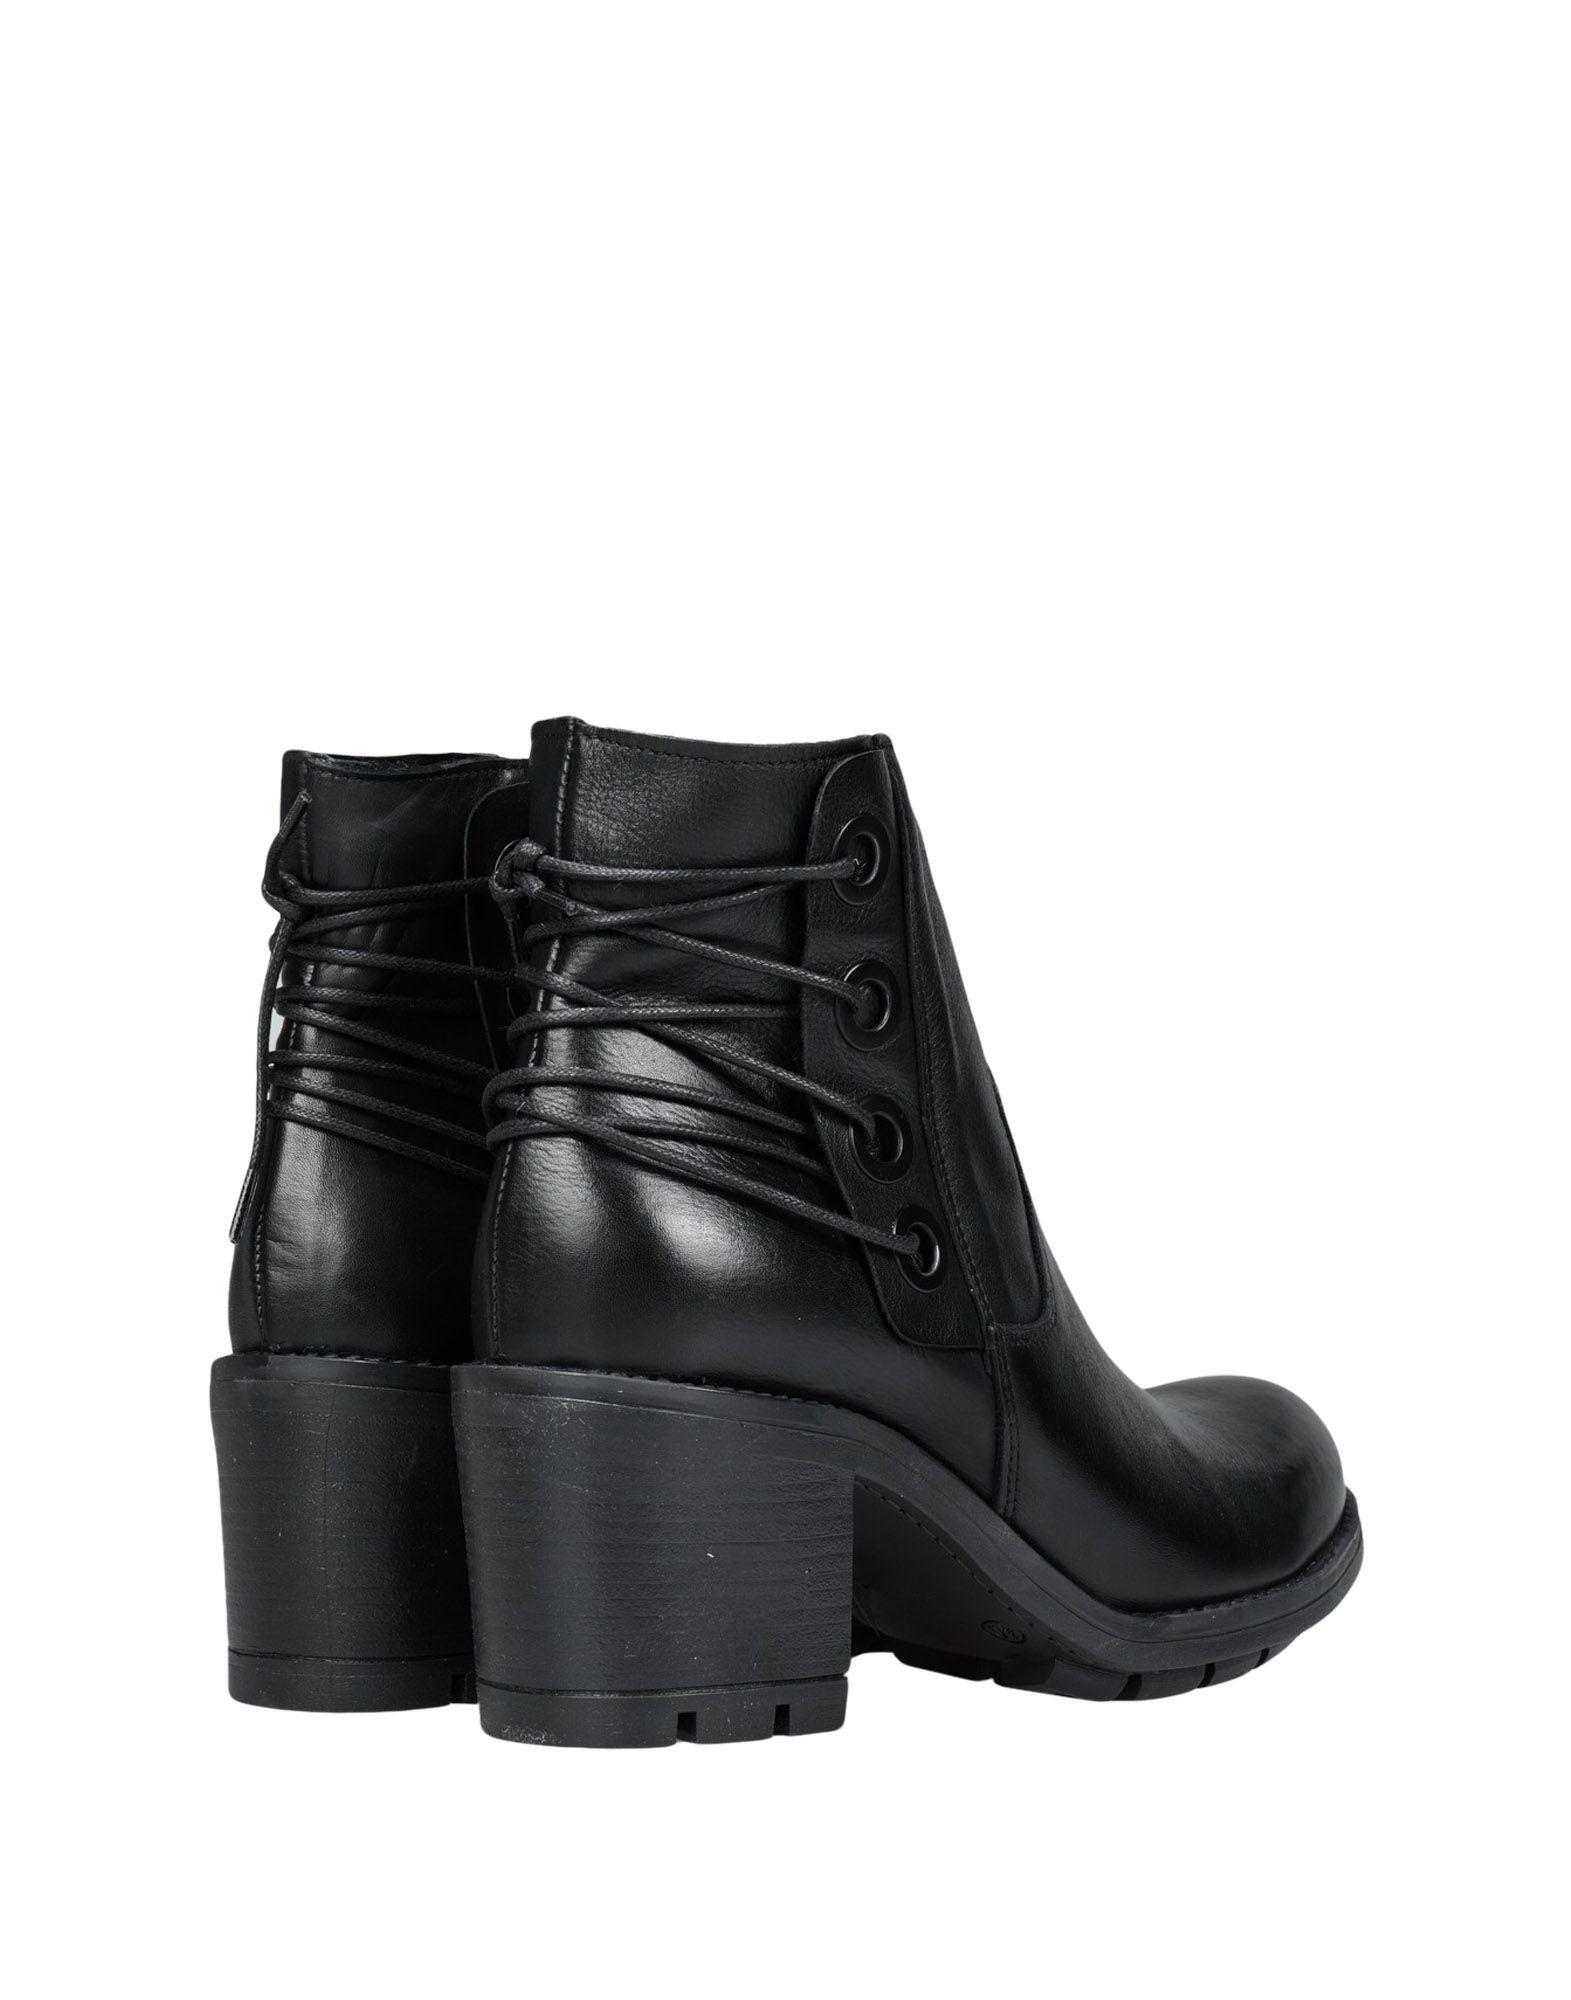 Carmine Damen Marfé Stiefelette Damen Carmine  11525766WN Neue Schuhe a5fe70